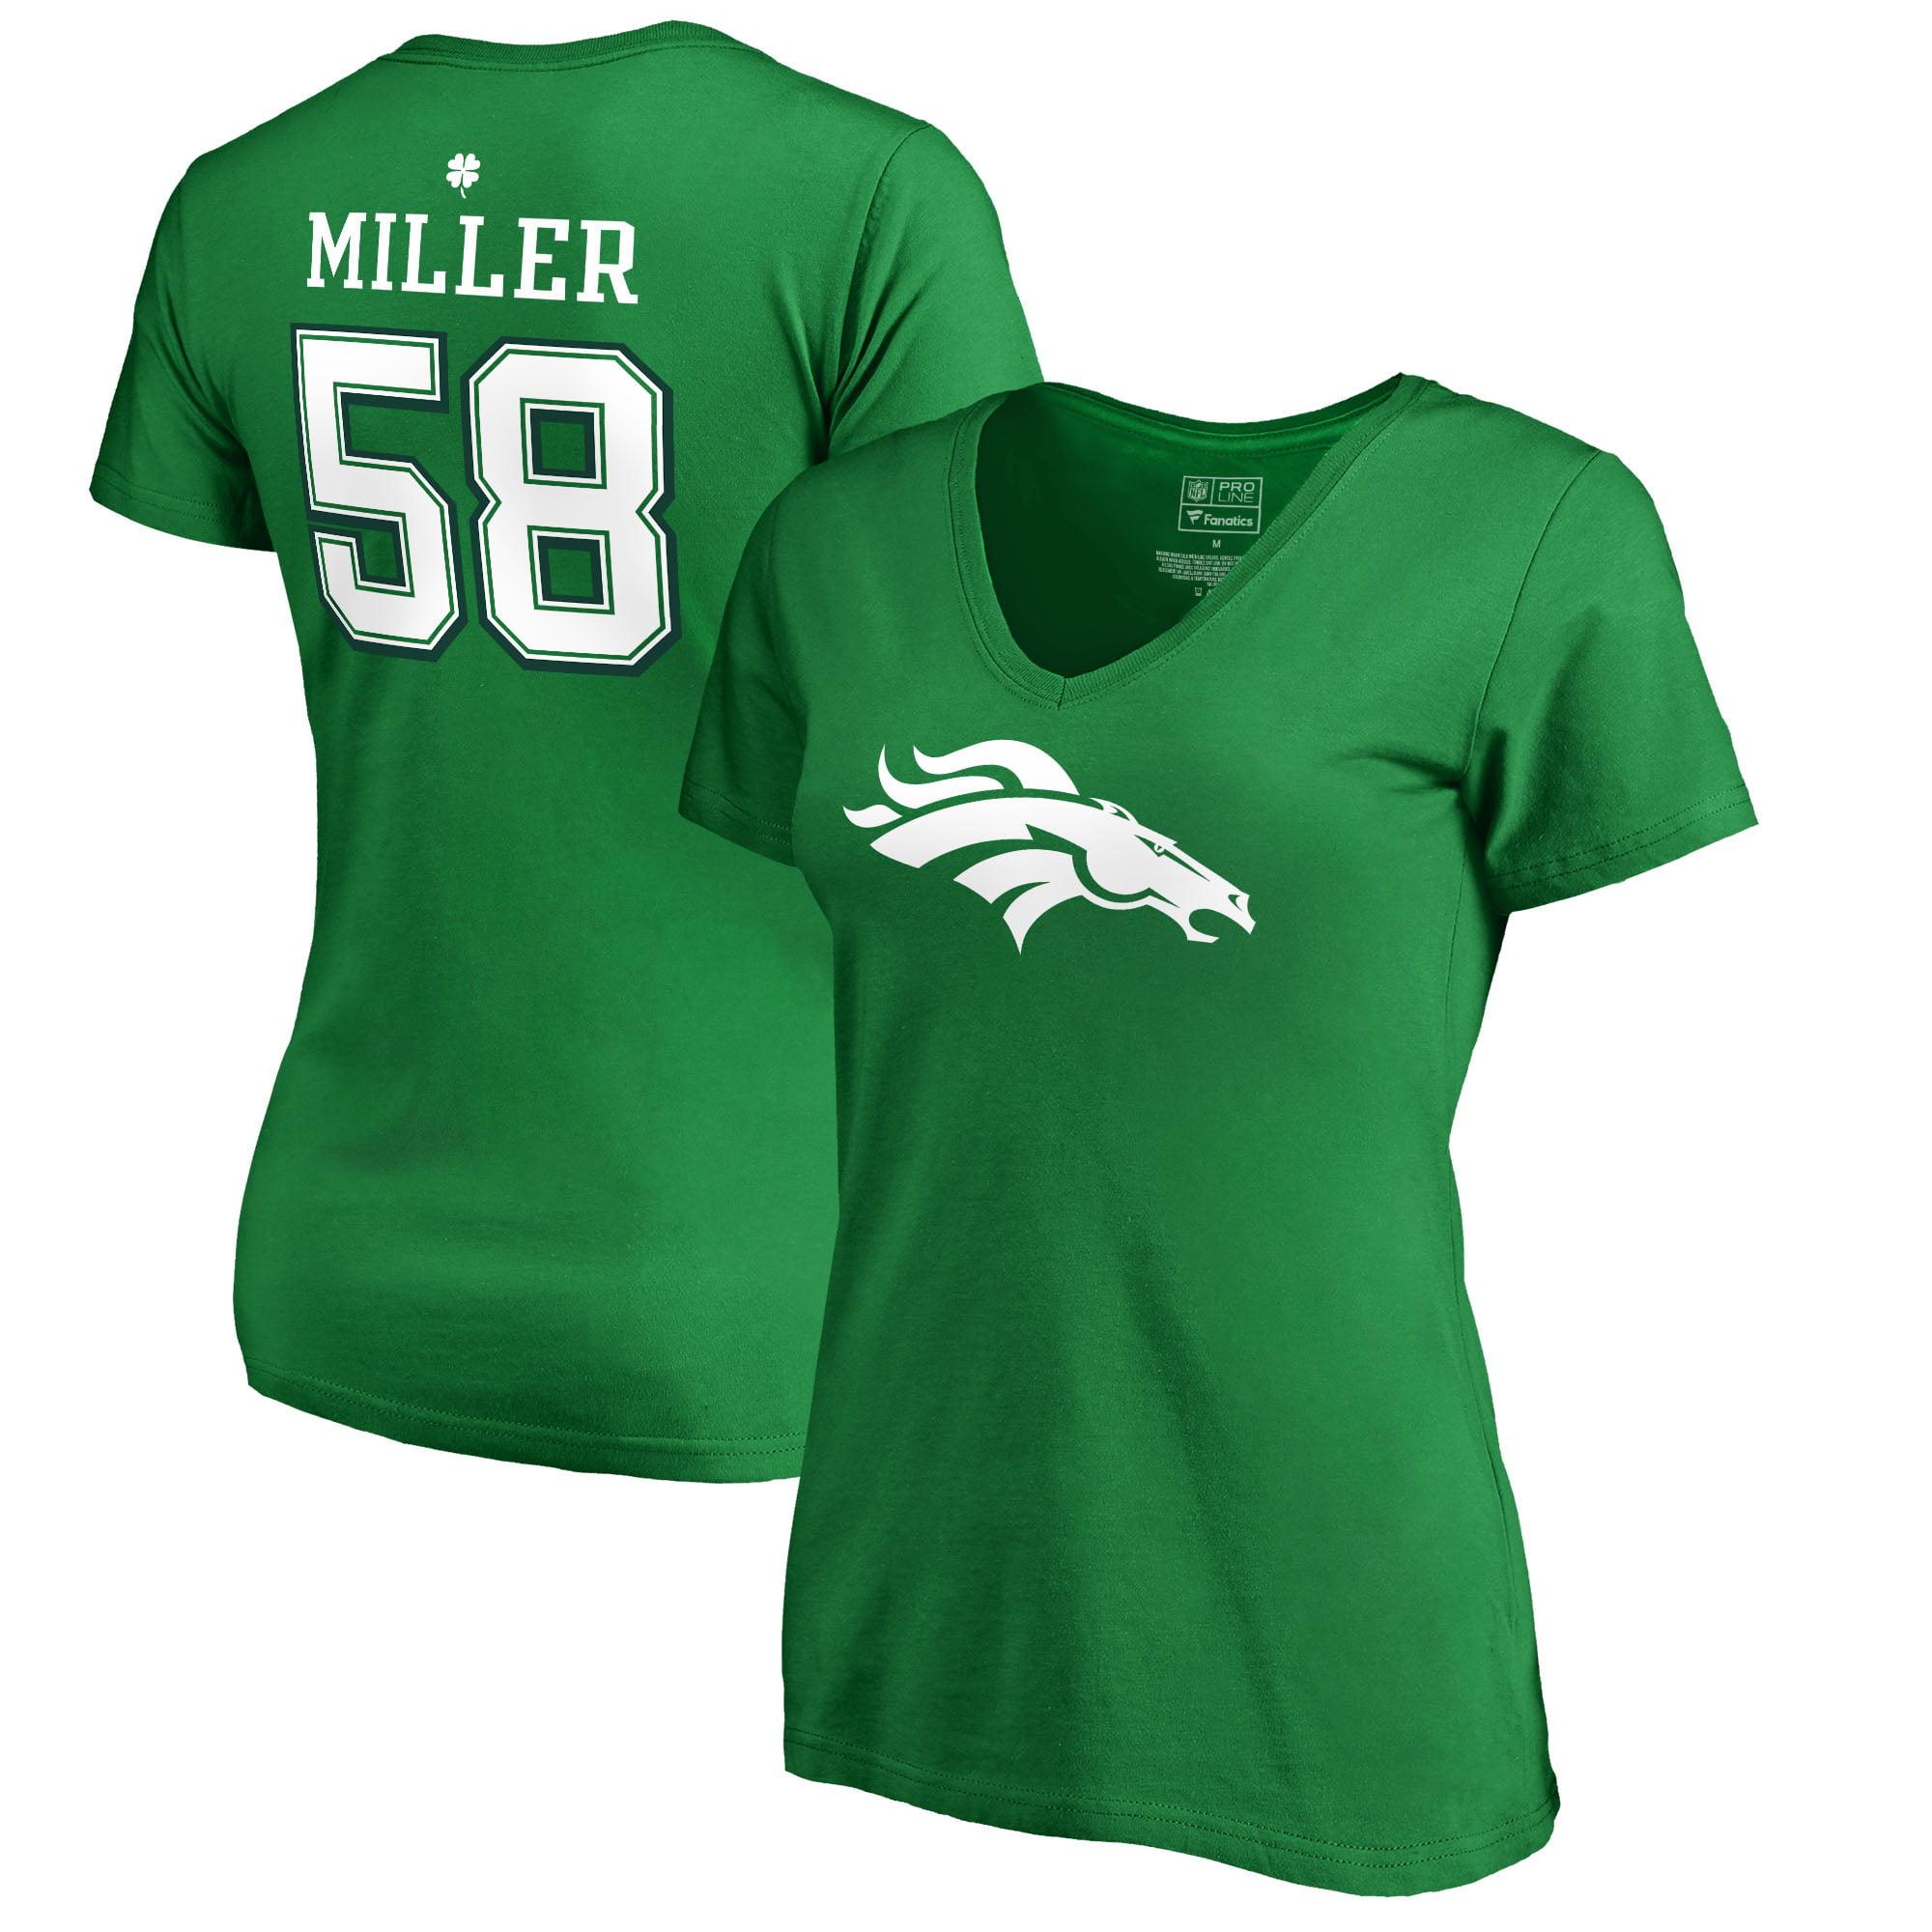 Von Miller Denver Broncos NFL Pro Line by Fanatics Branded Women's St. Patrick's Day Icon V-Neck Name & Number T-Shirt - Kelly Green